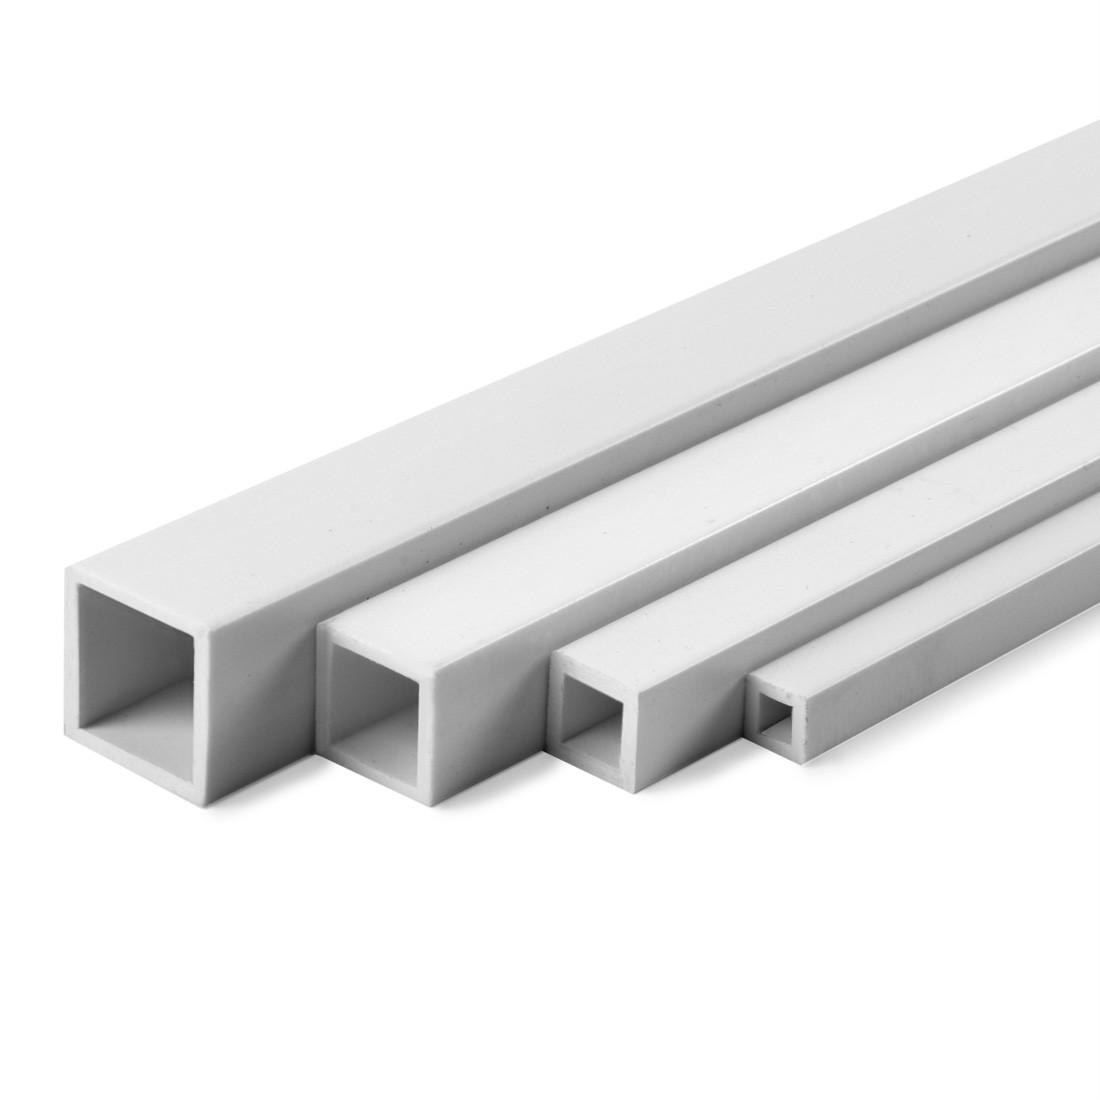 ASA square tube profile mm.4x6x1000